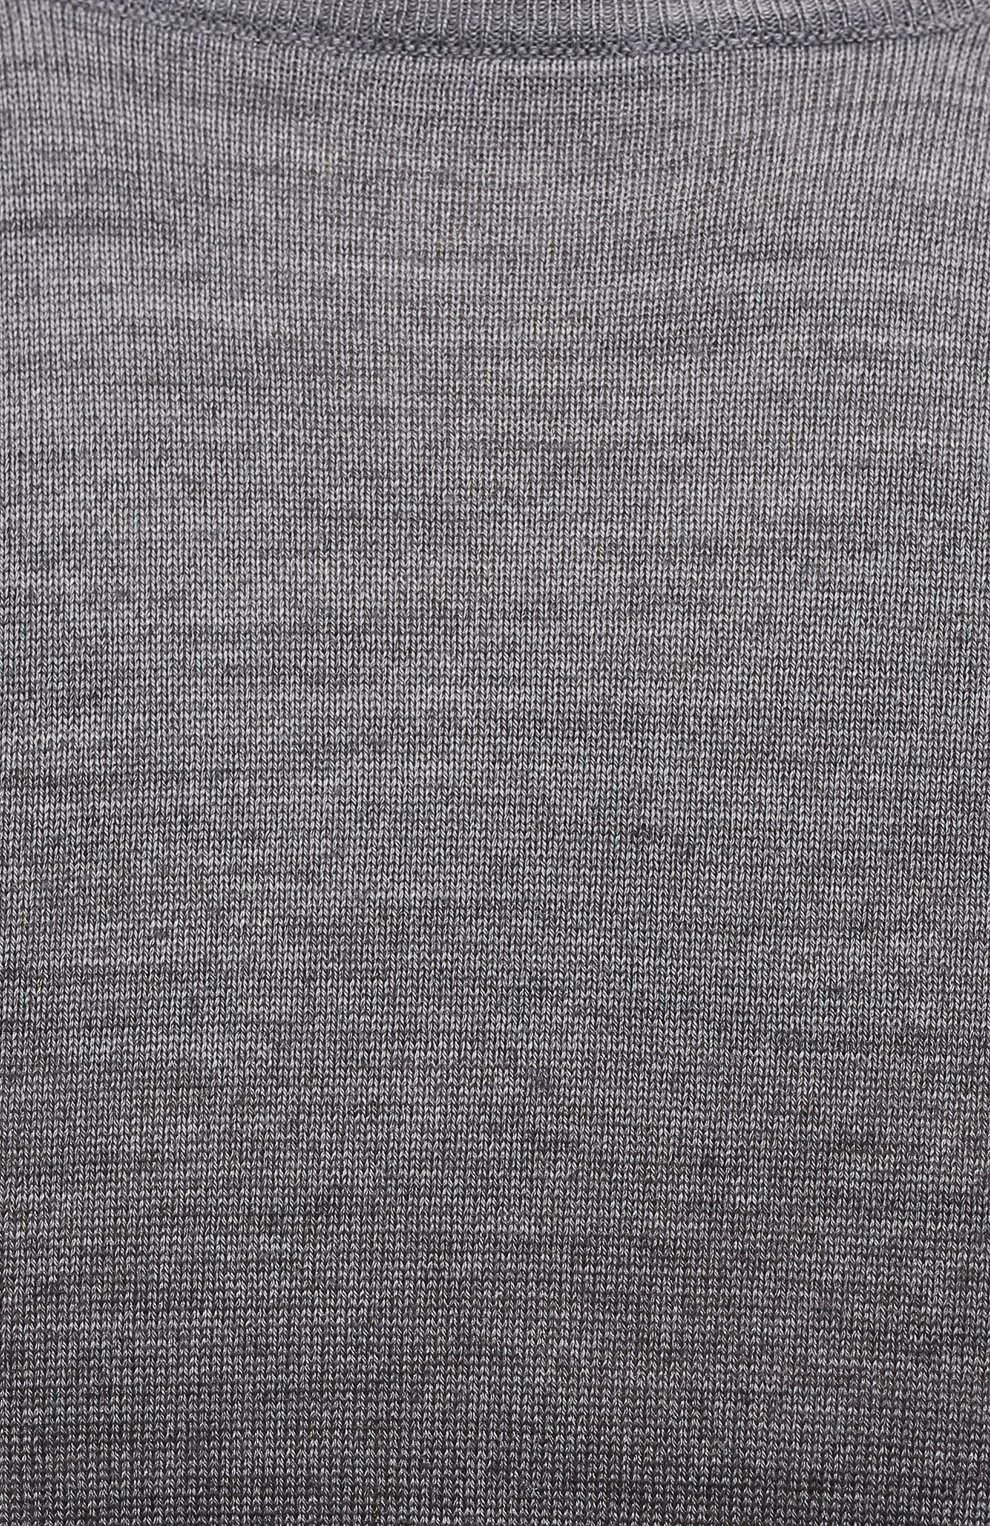 Мужской джемпер из шерсти и шелка CANALI серого цвета, арт. C0719/MX01166   Фото 5